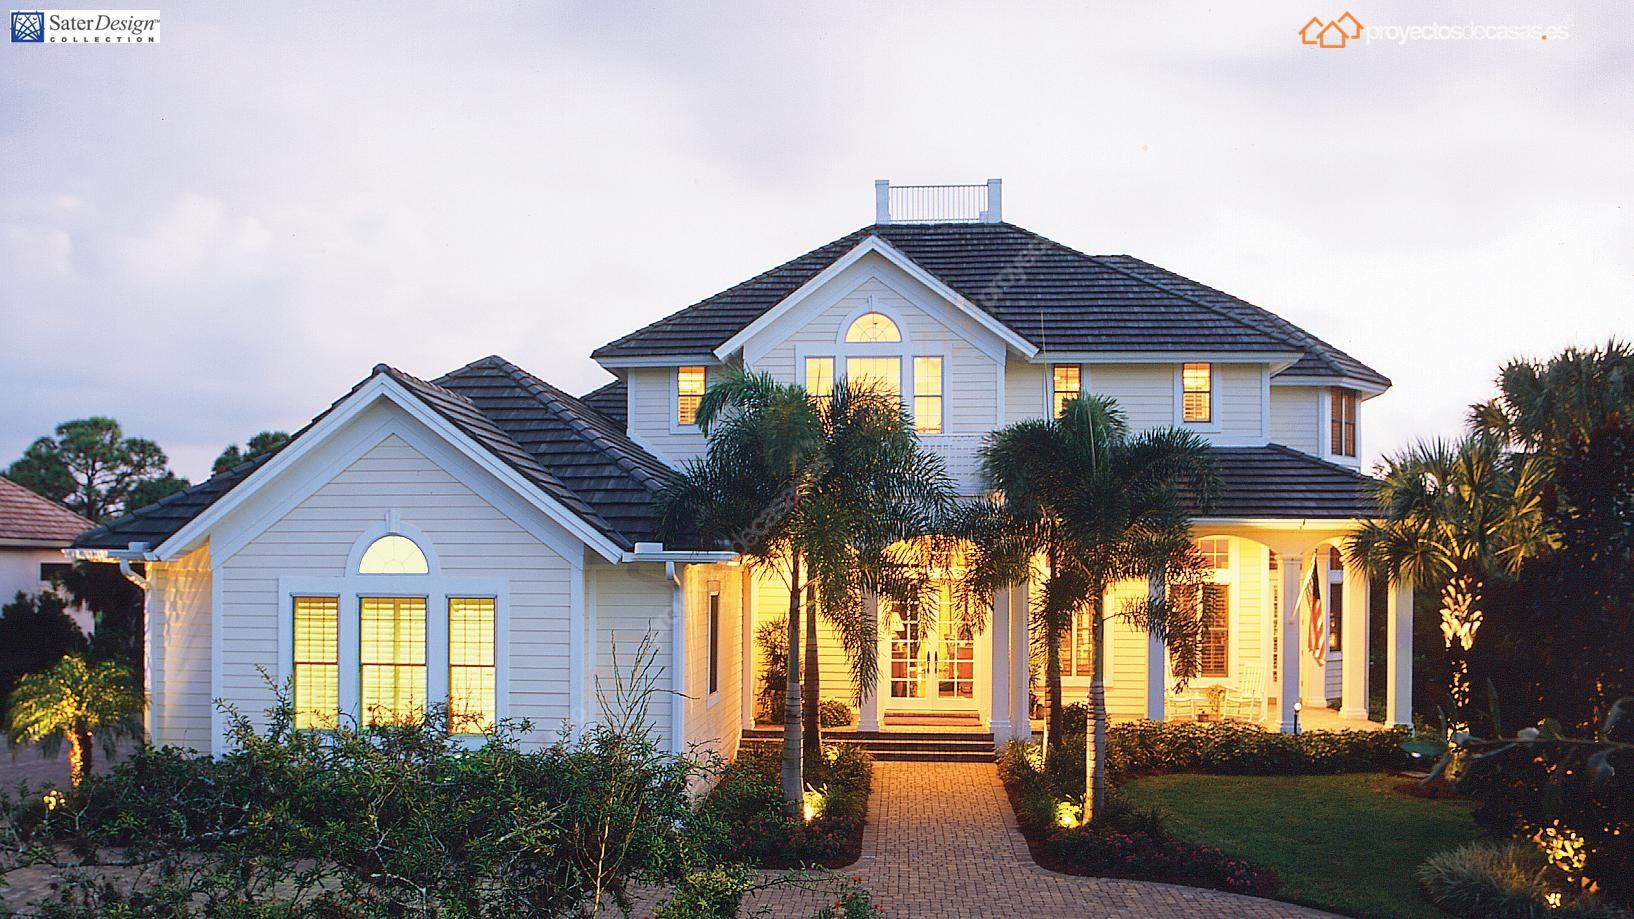 Proyectosdecasas dise amos y construimos casas en toda for Planos de casas norteamericanas